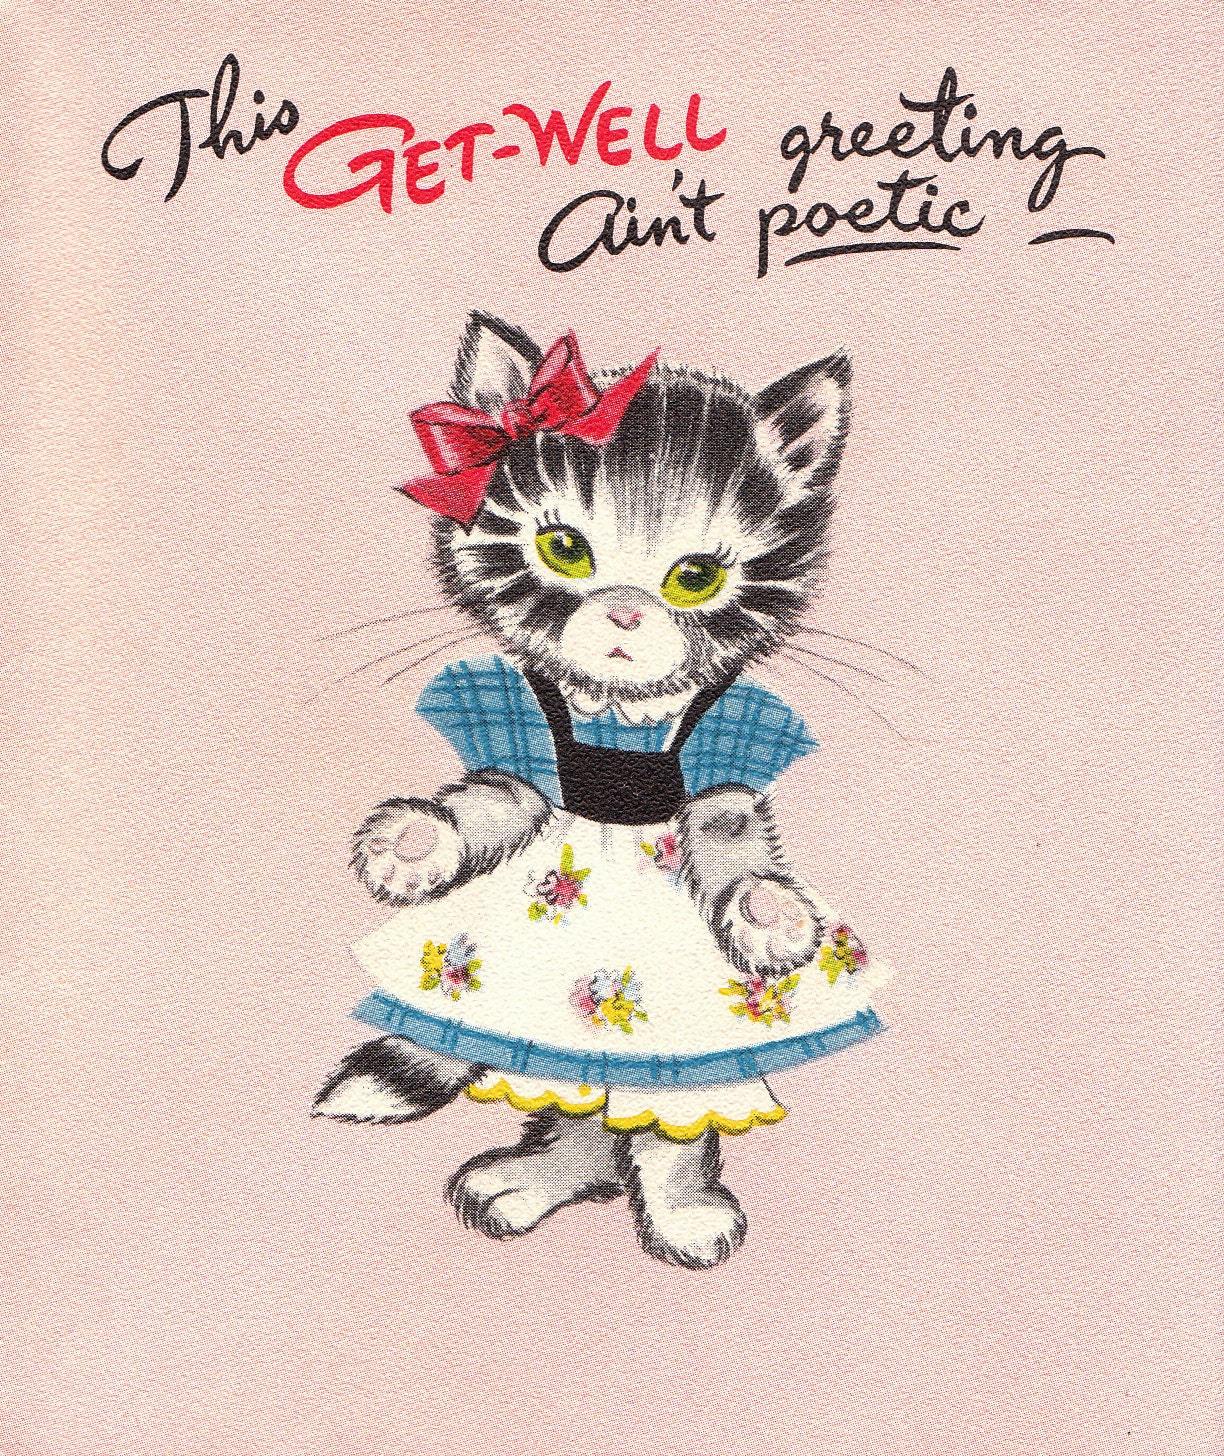 Vintage get well card